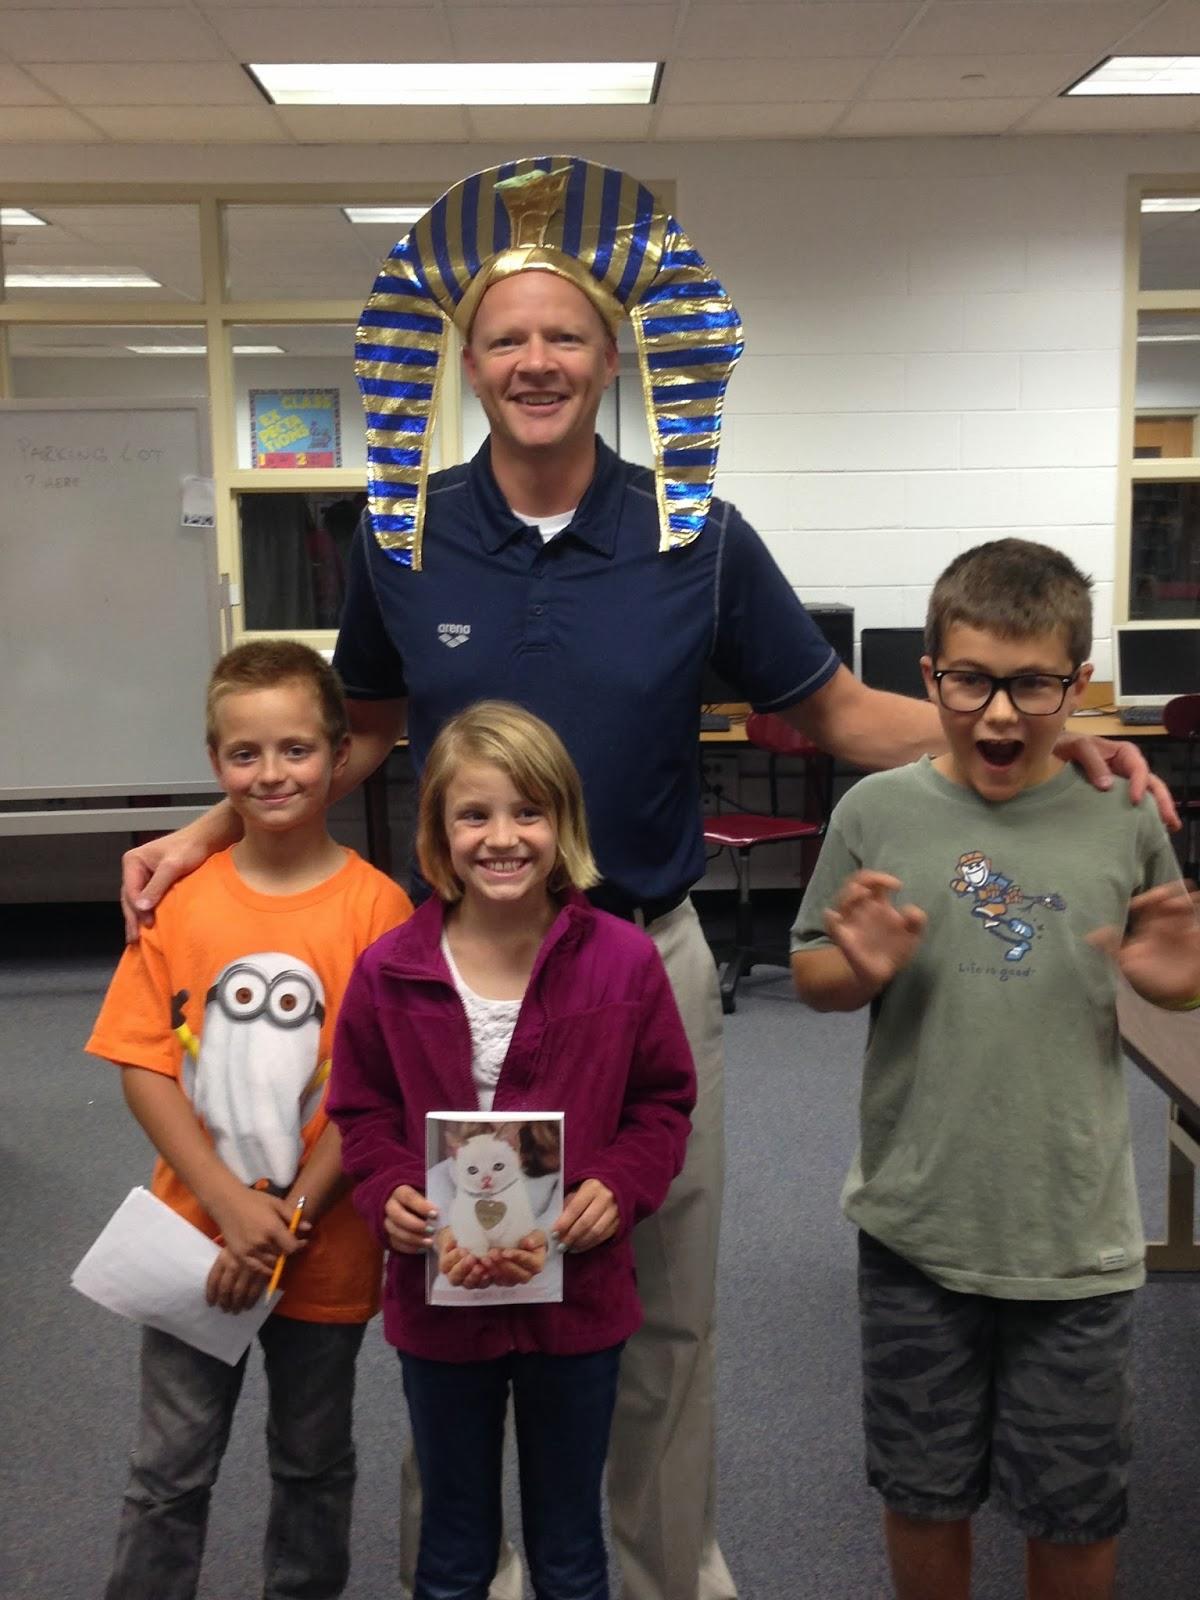 Yorkville Intermediate School Hosts Successful Family Read